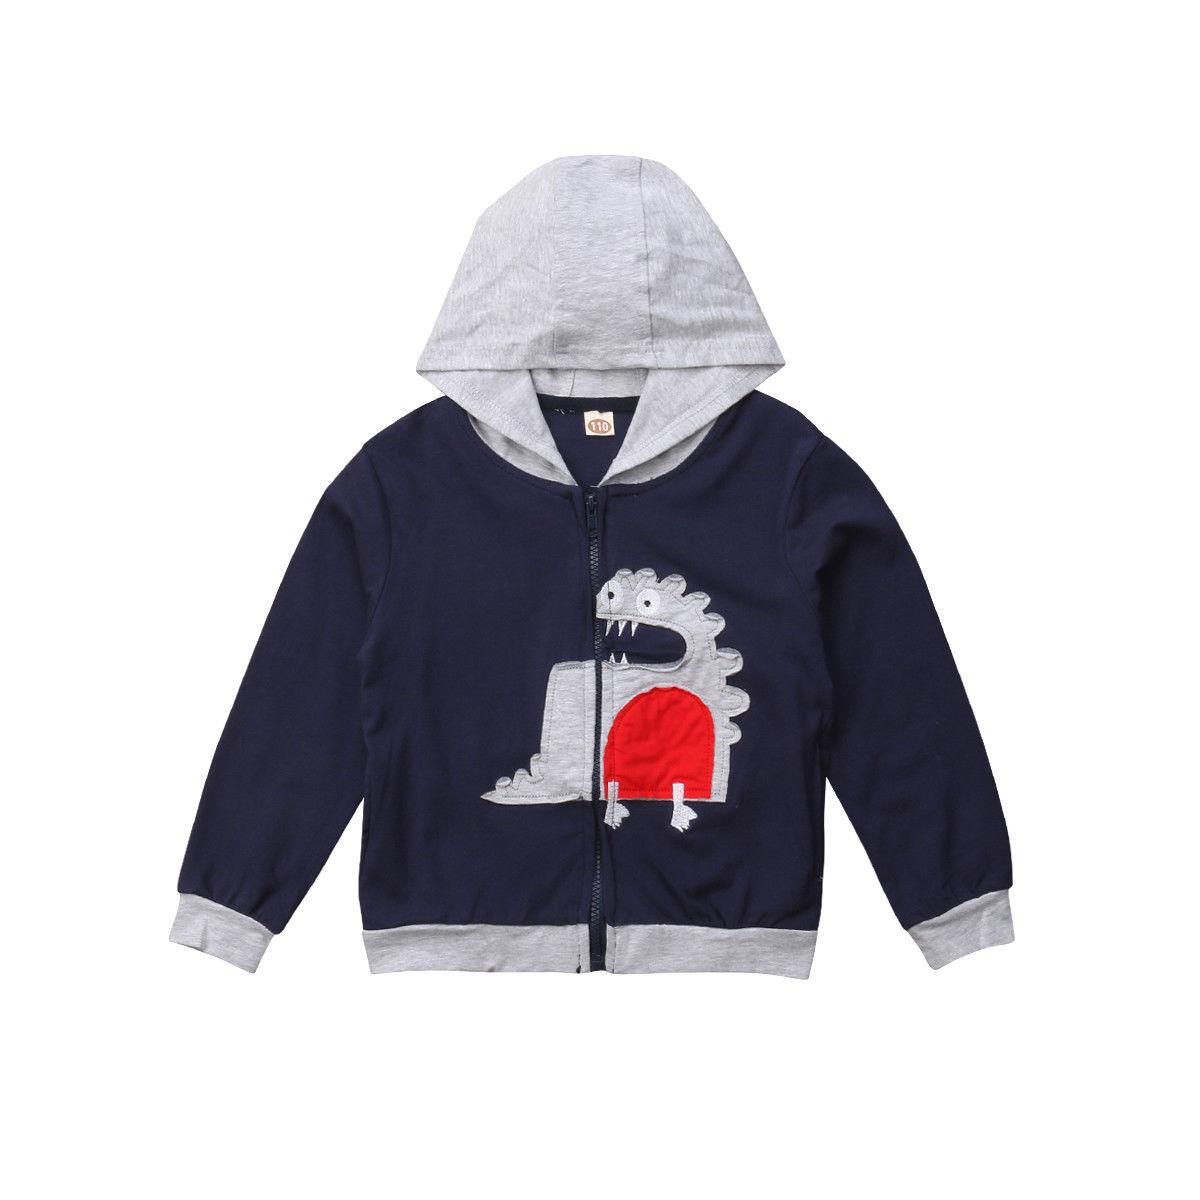 1-6 T Infant Kinder Mädchen Junge Dinosaurier Cartoon Mit Kapuze Hoodie Top Winddicht Jacke Oberbekleidung Mode Nette Mantel Kleidung Streetwear